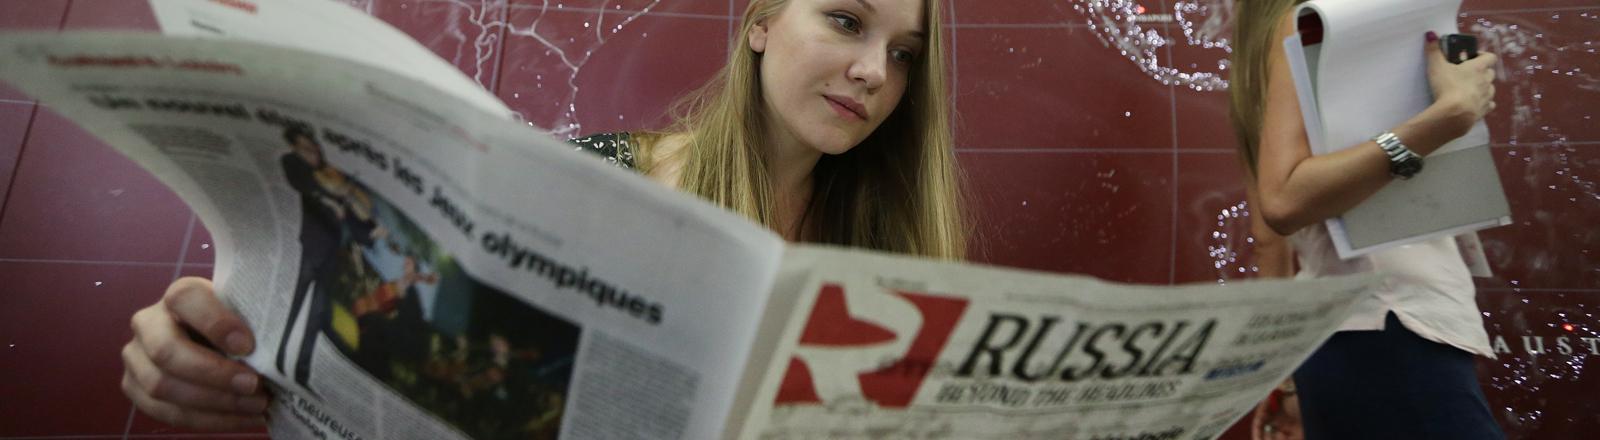 Russian beyond the headlines